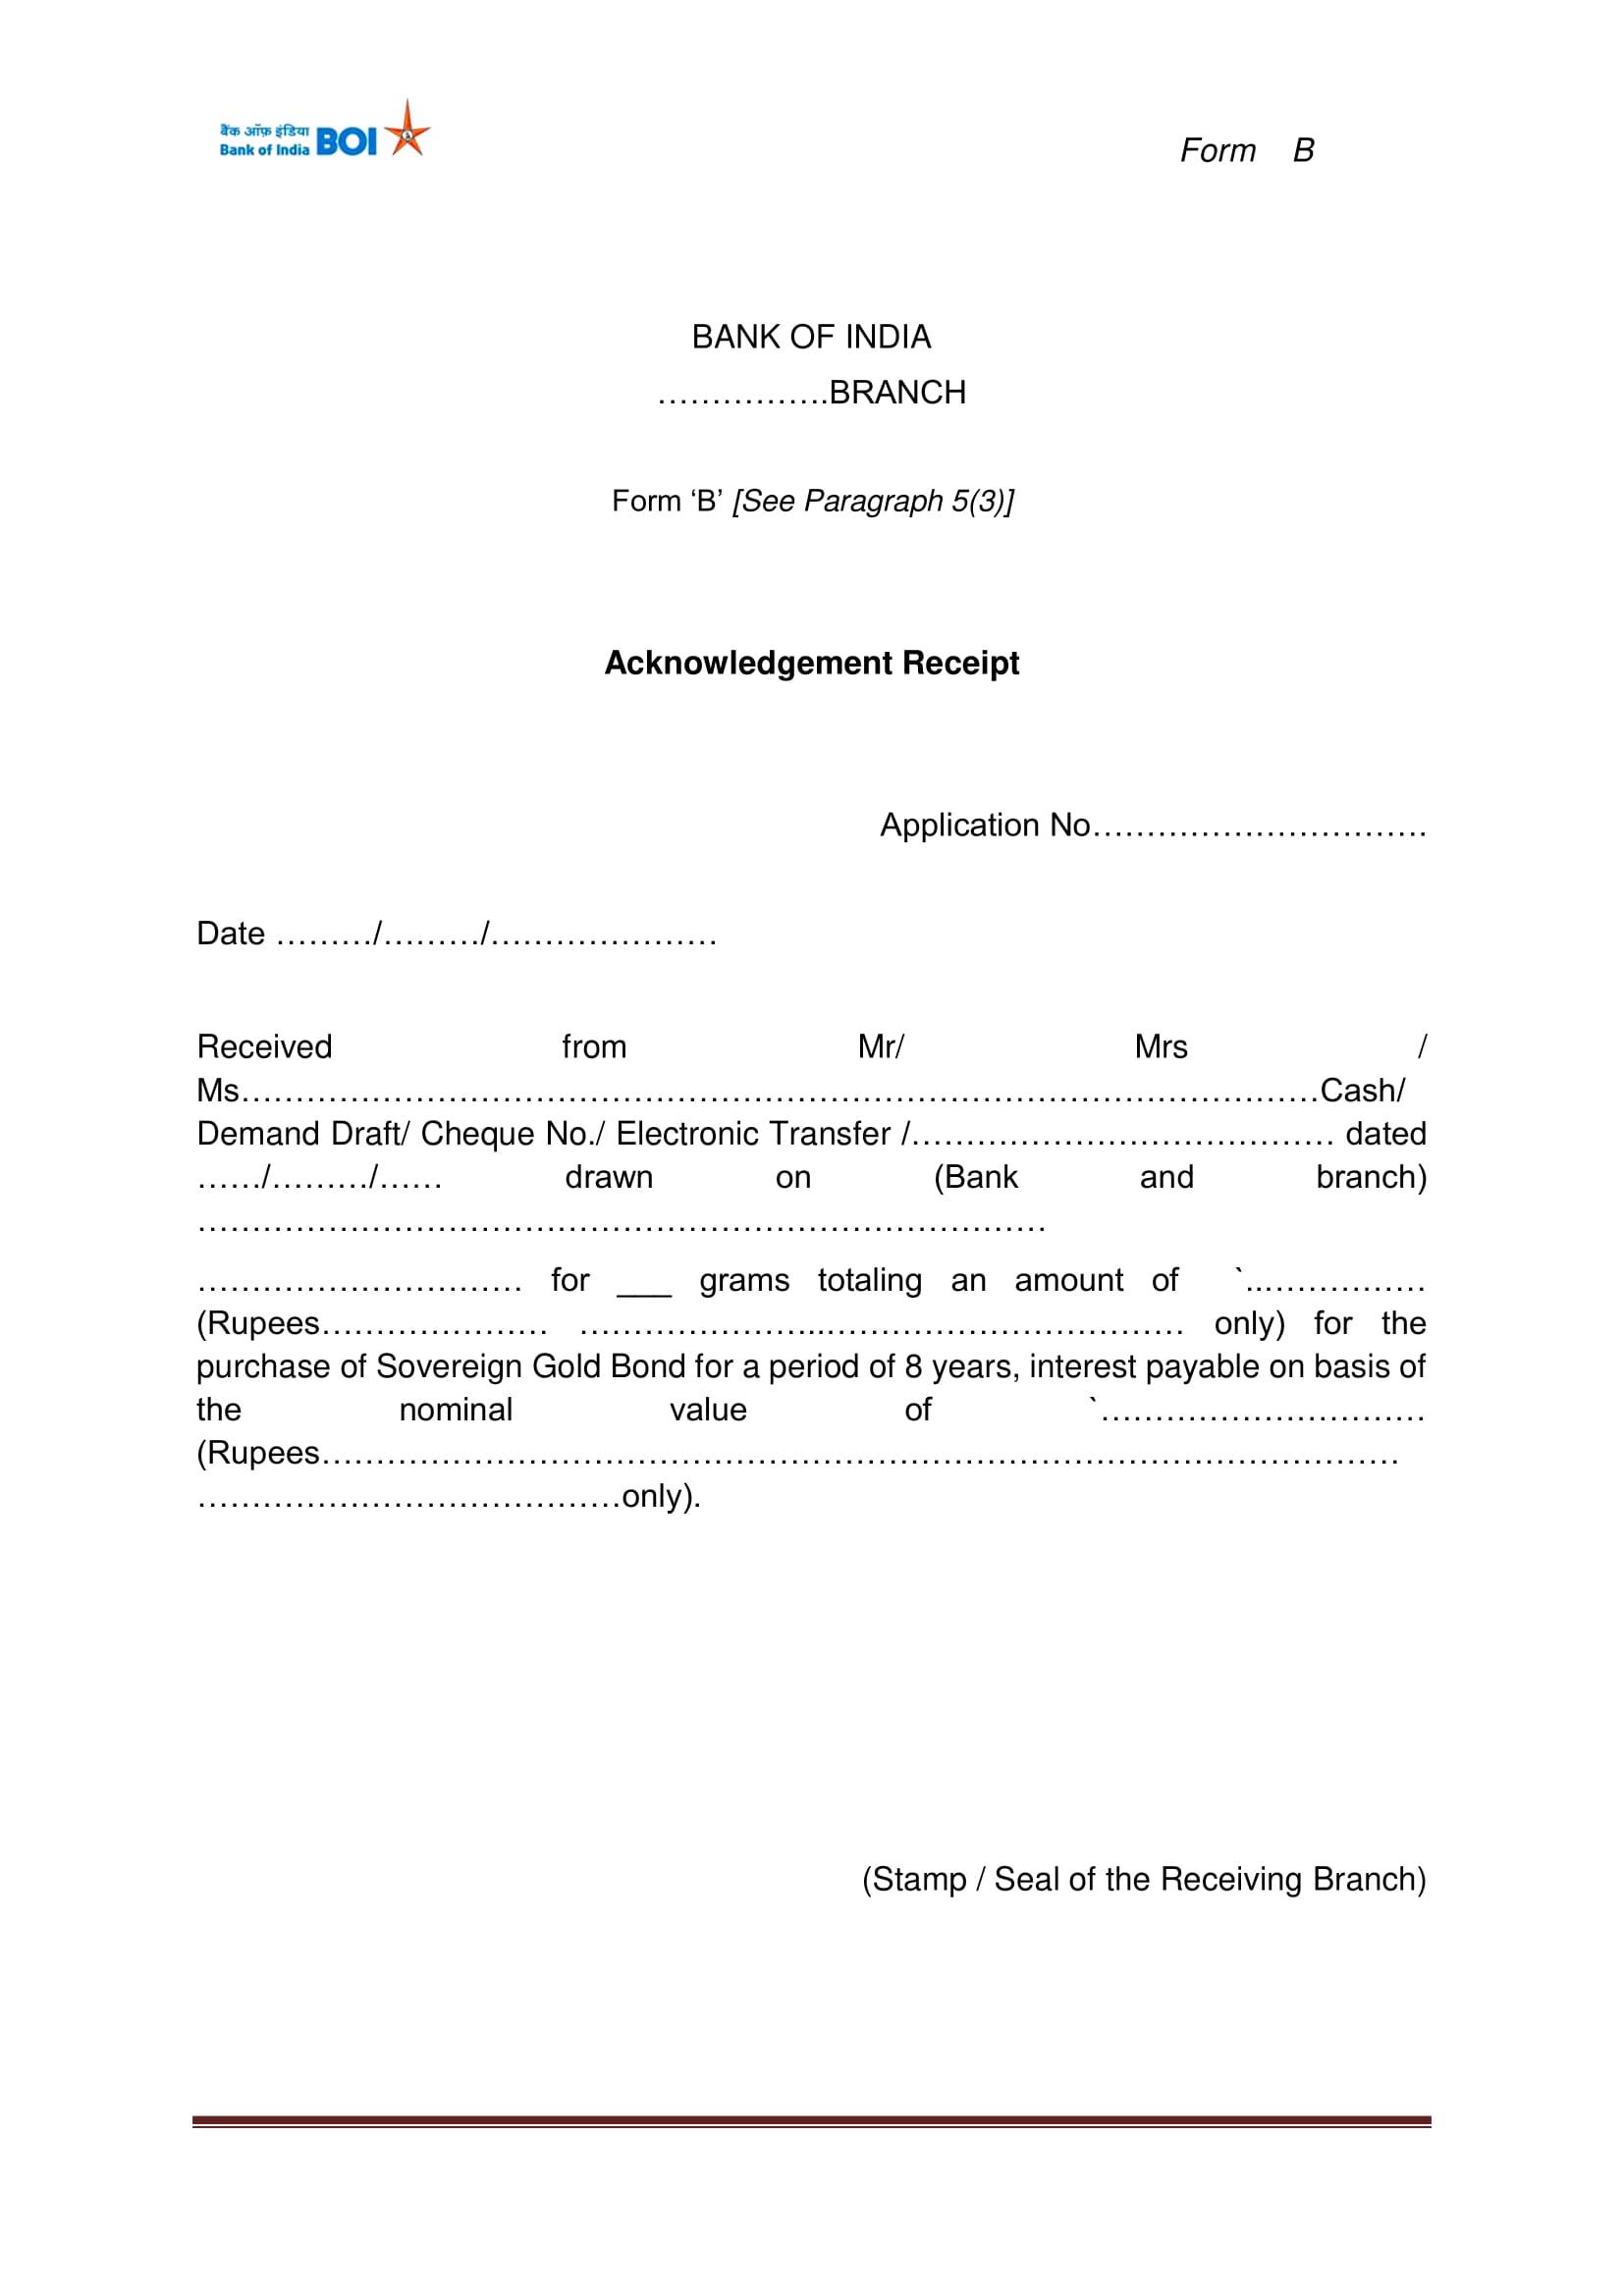 acknowledgement receipt example